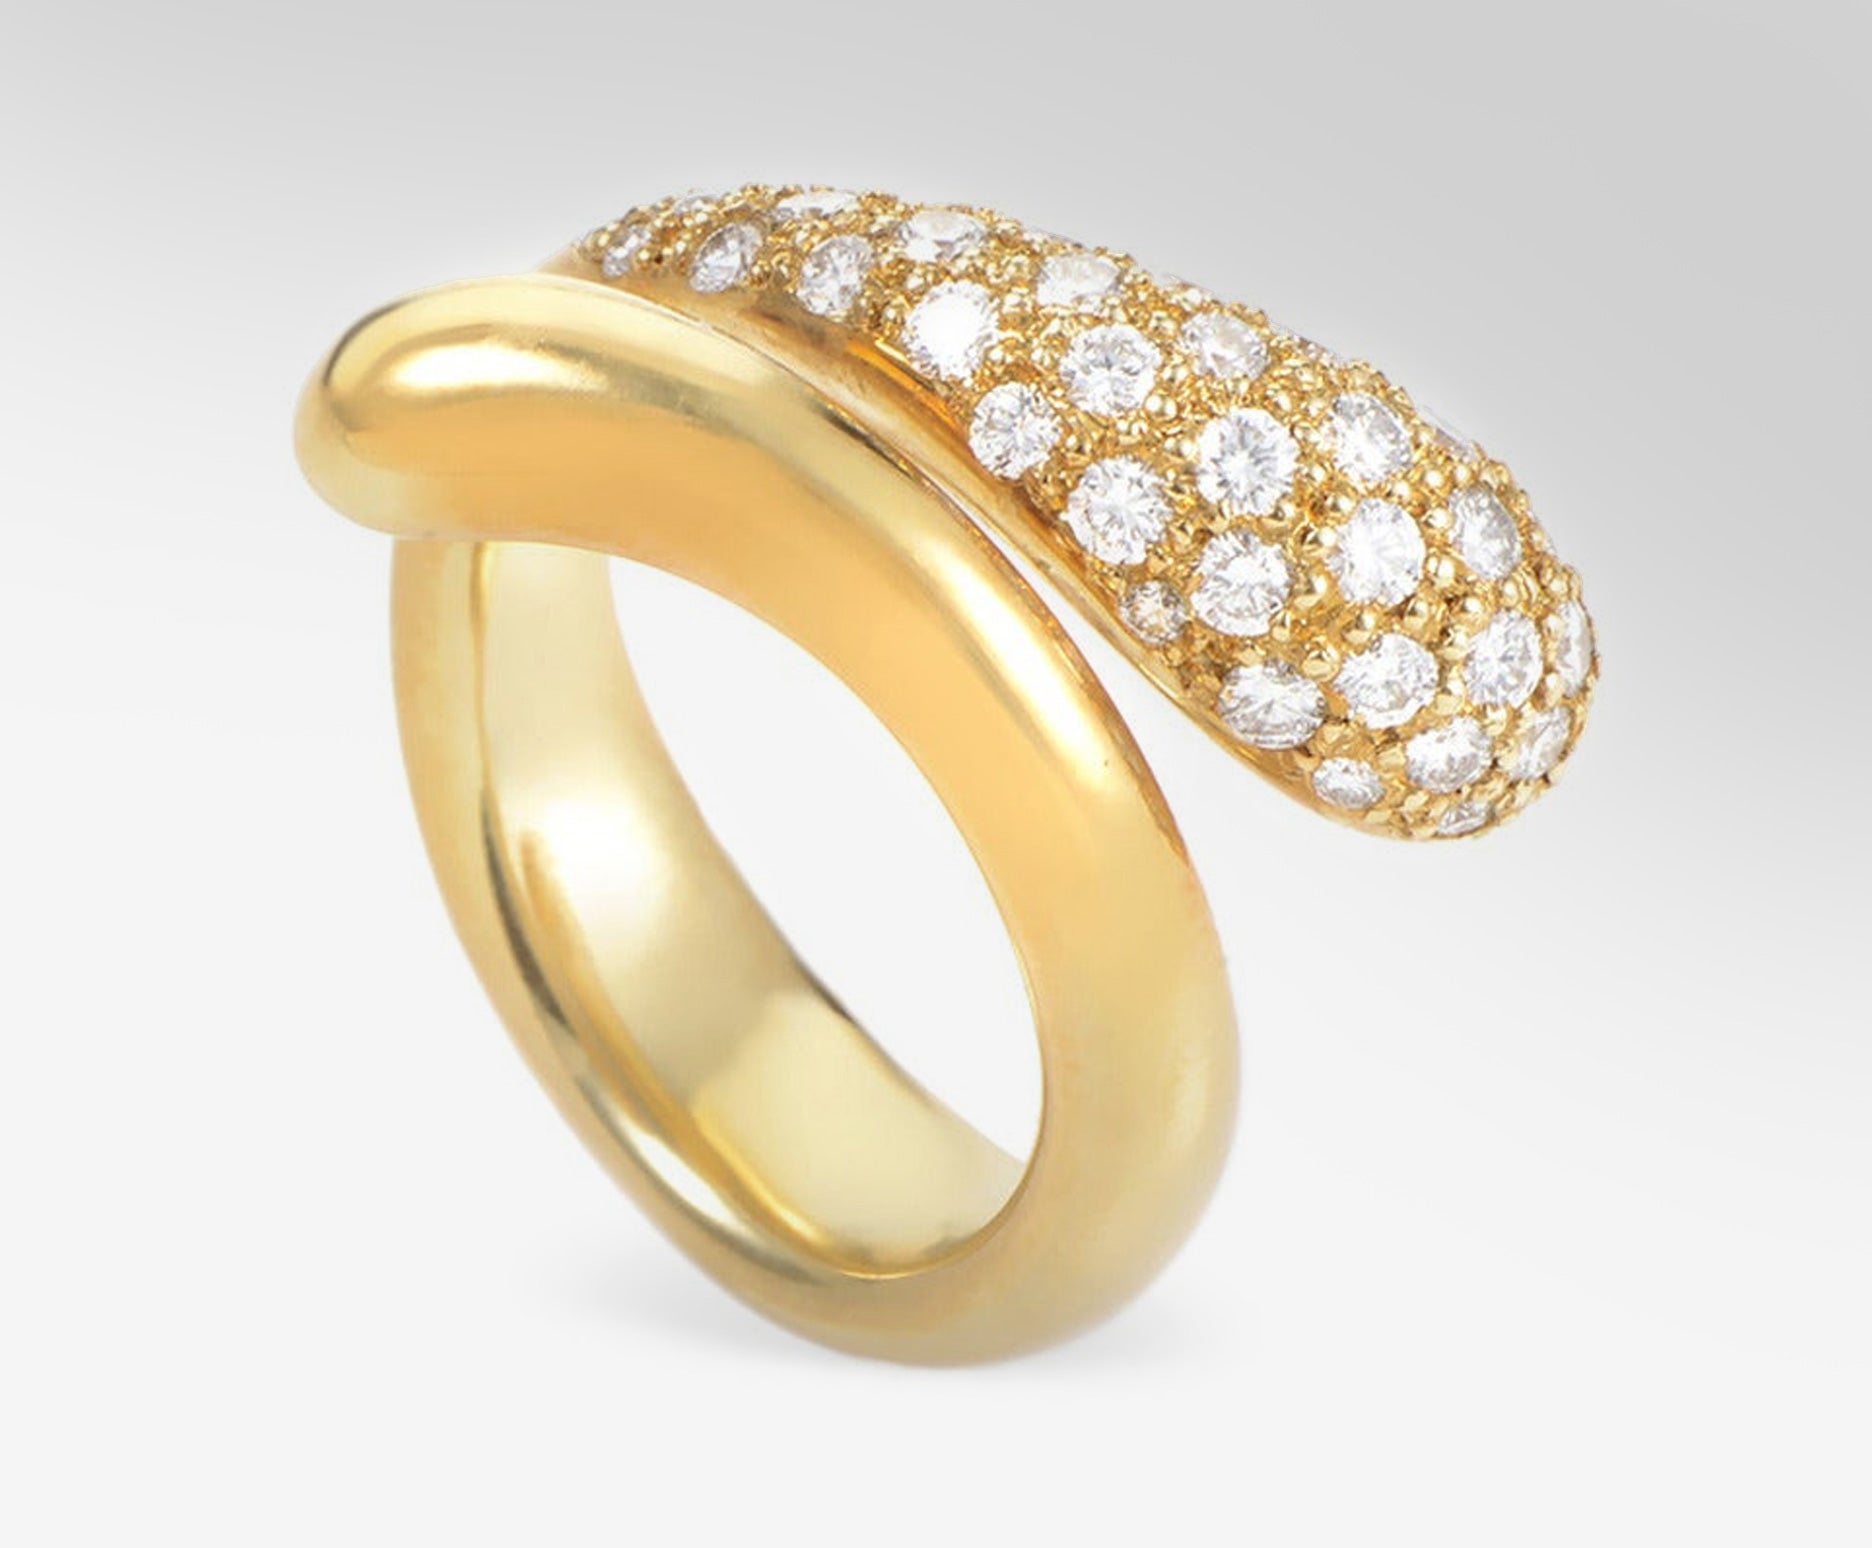 Teardrop Ring